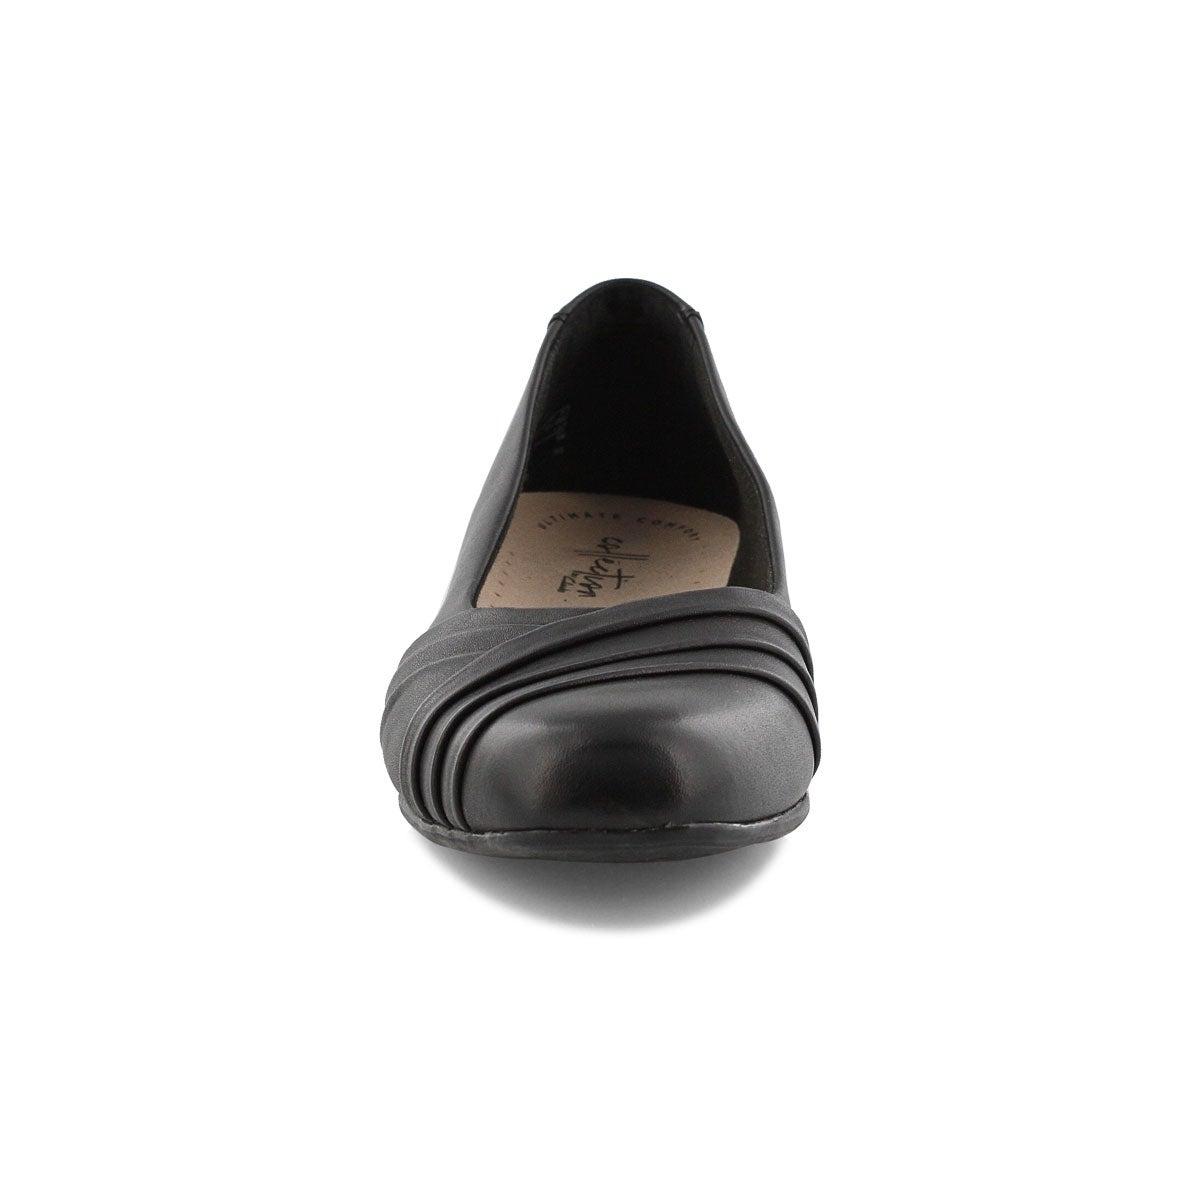 Lds Juliet Petra blk slip on dress heel